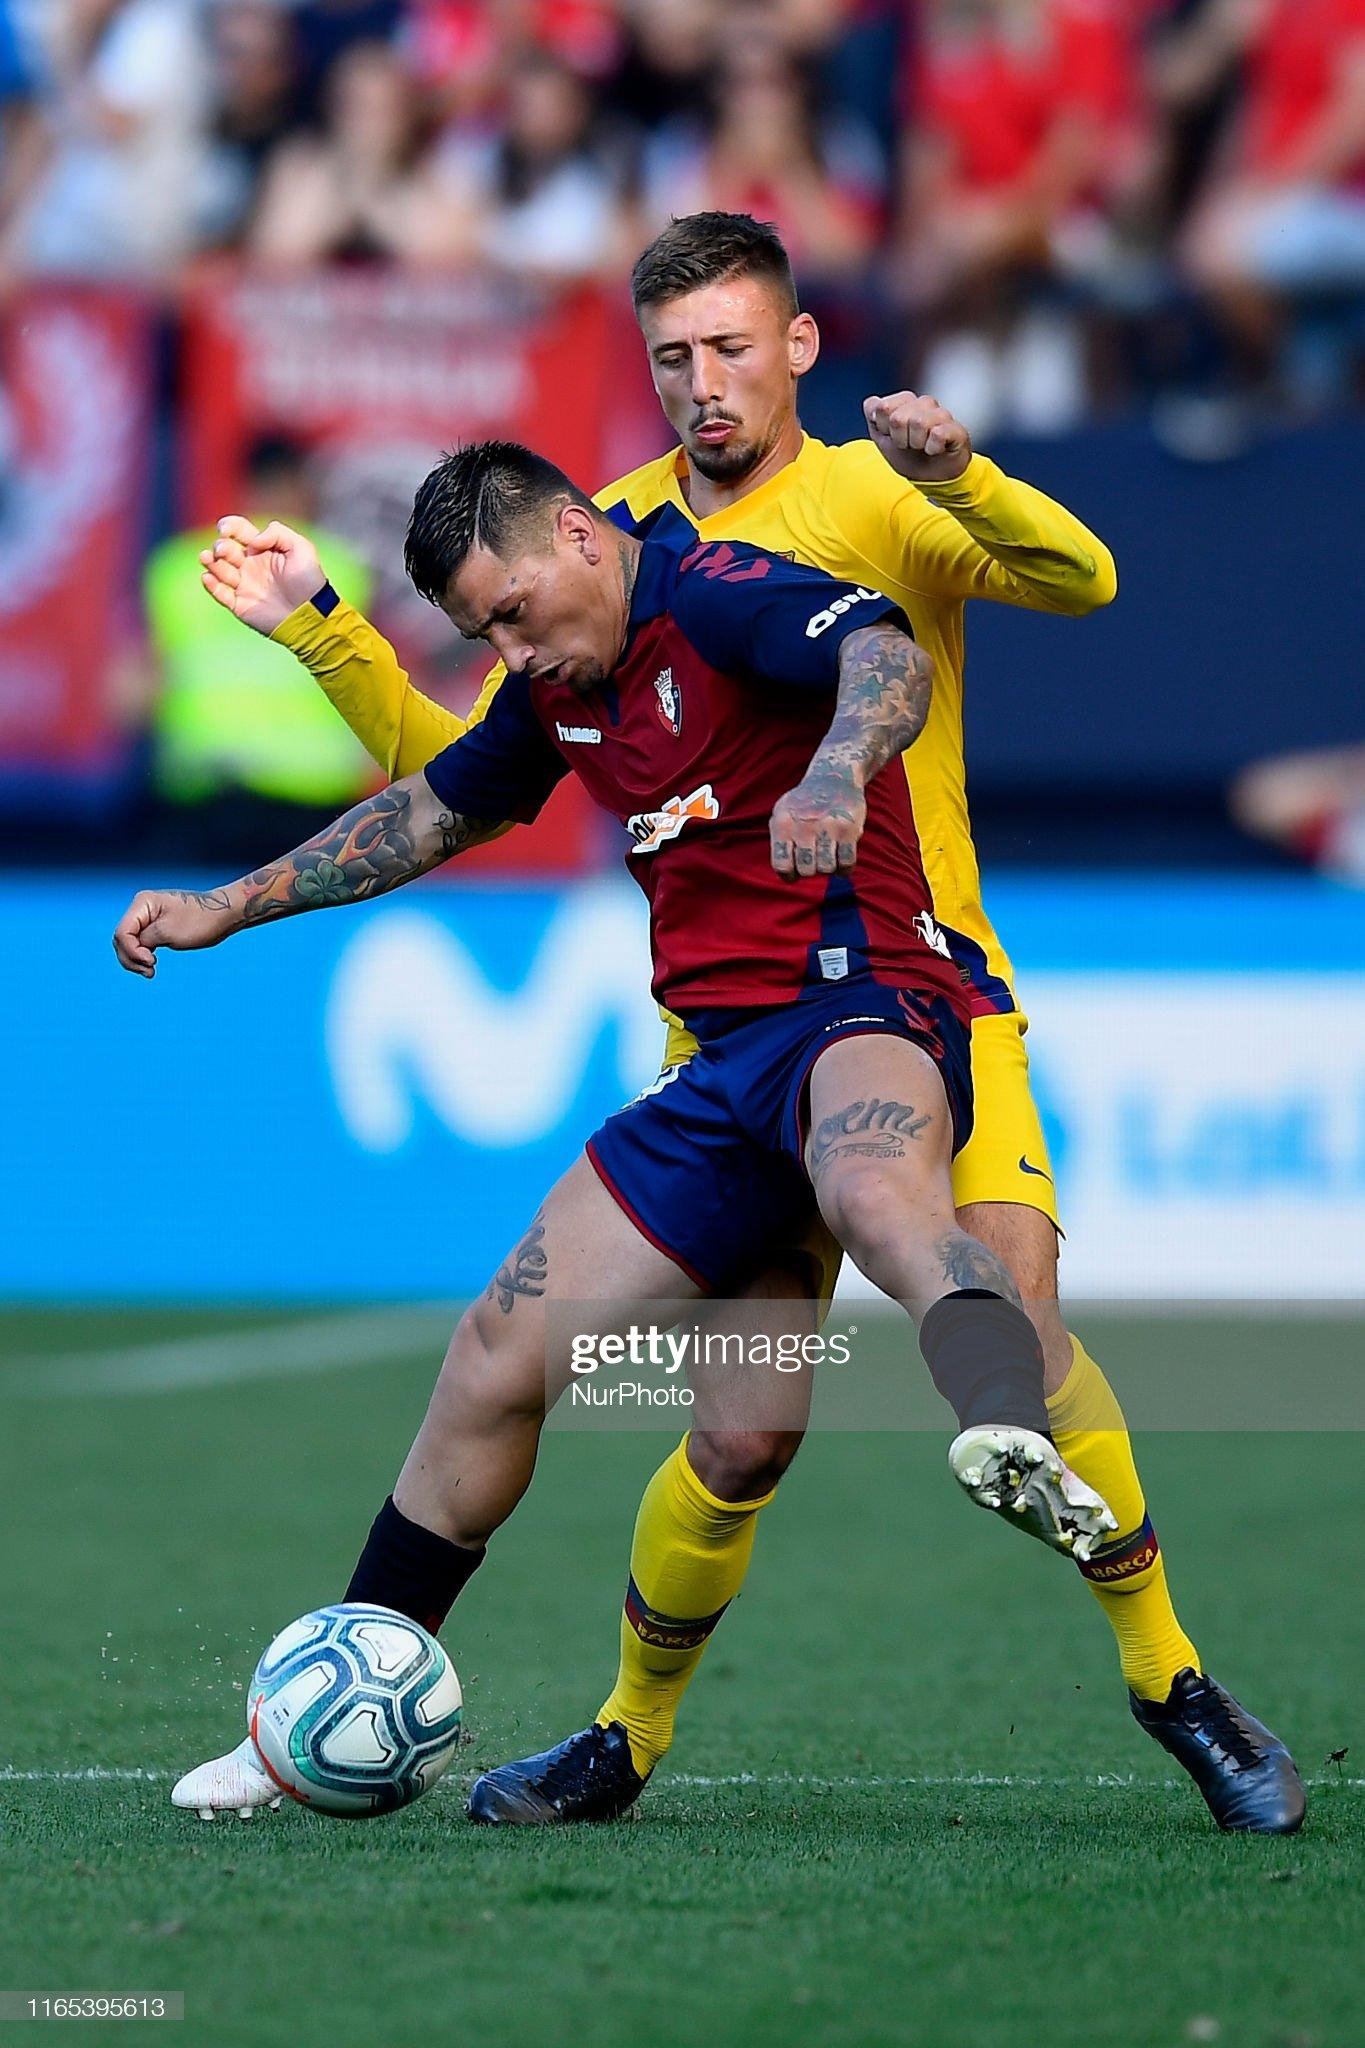 صور مباراة : أوساسونا - برشلونة 2-2 ( 31-08-2019 )  Chimy-avila-of-osasuna-and-clement-lenglet-of-barcelona-competes-for-picture-id1165395613?s=2048x2048